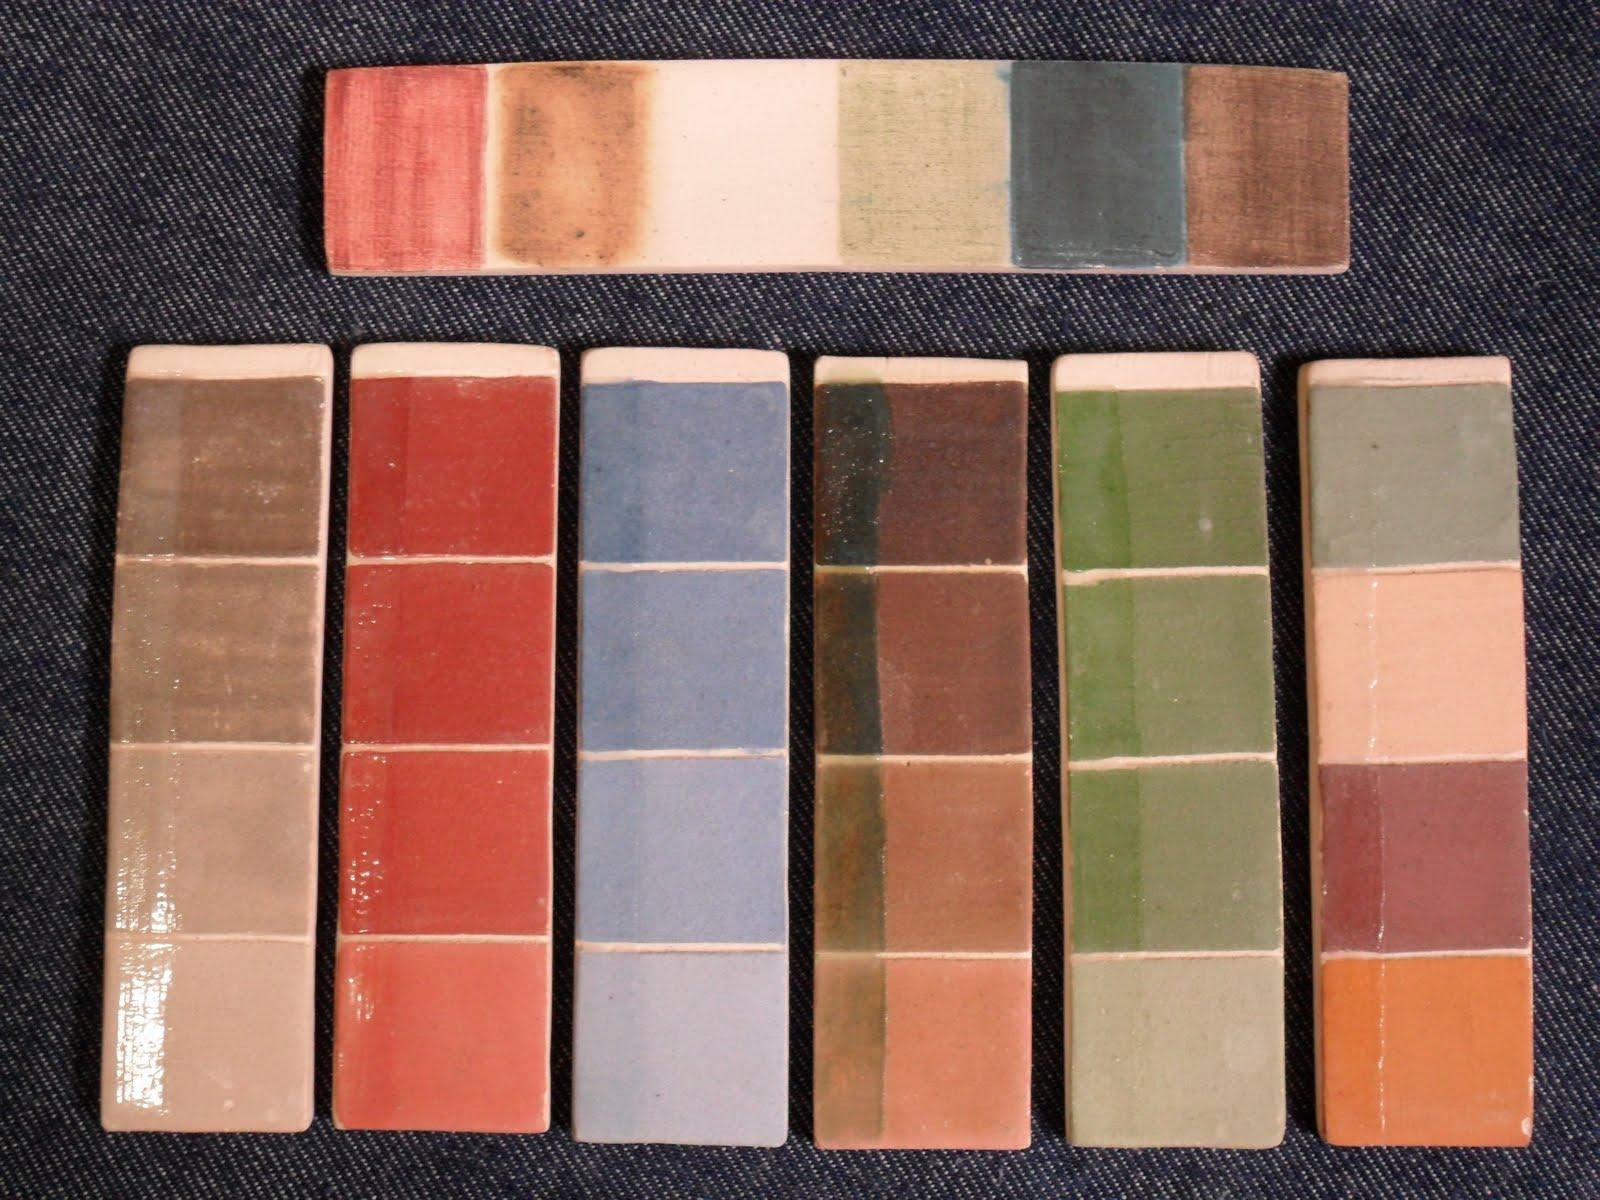 Xidos y engobes for Oxidos para ceramica